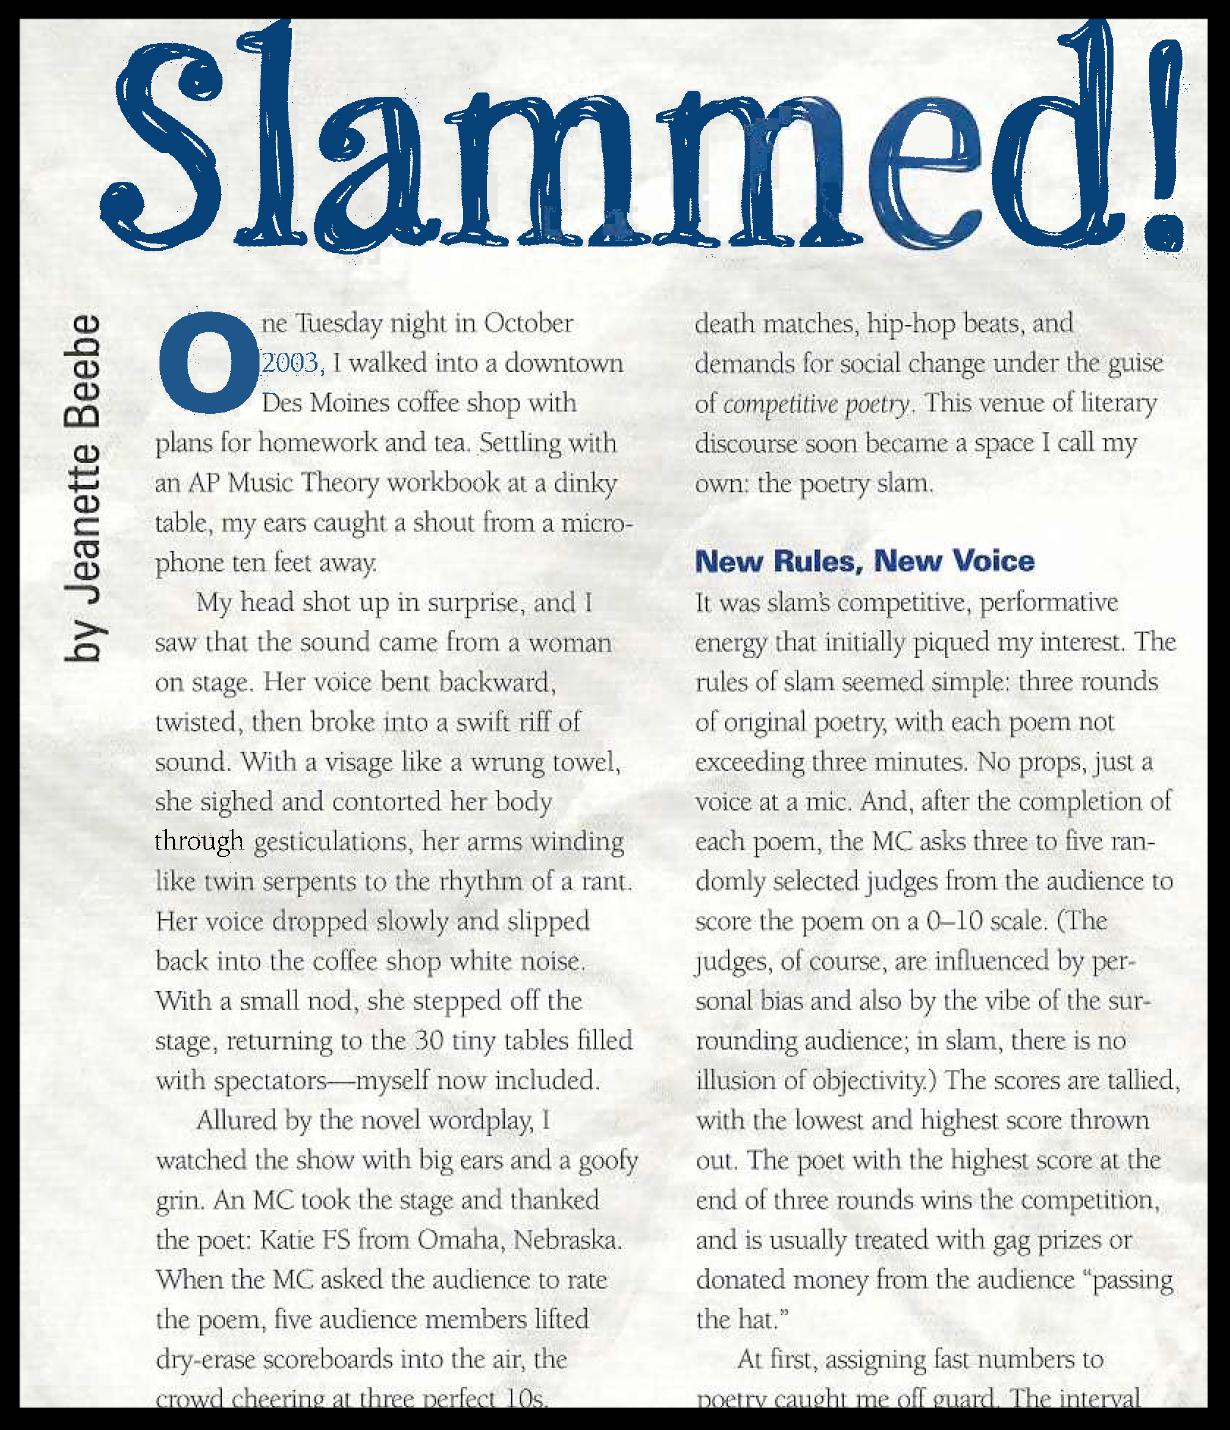 Imagine magazine, Johns Hopkins University (2005)